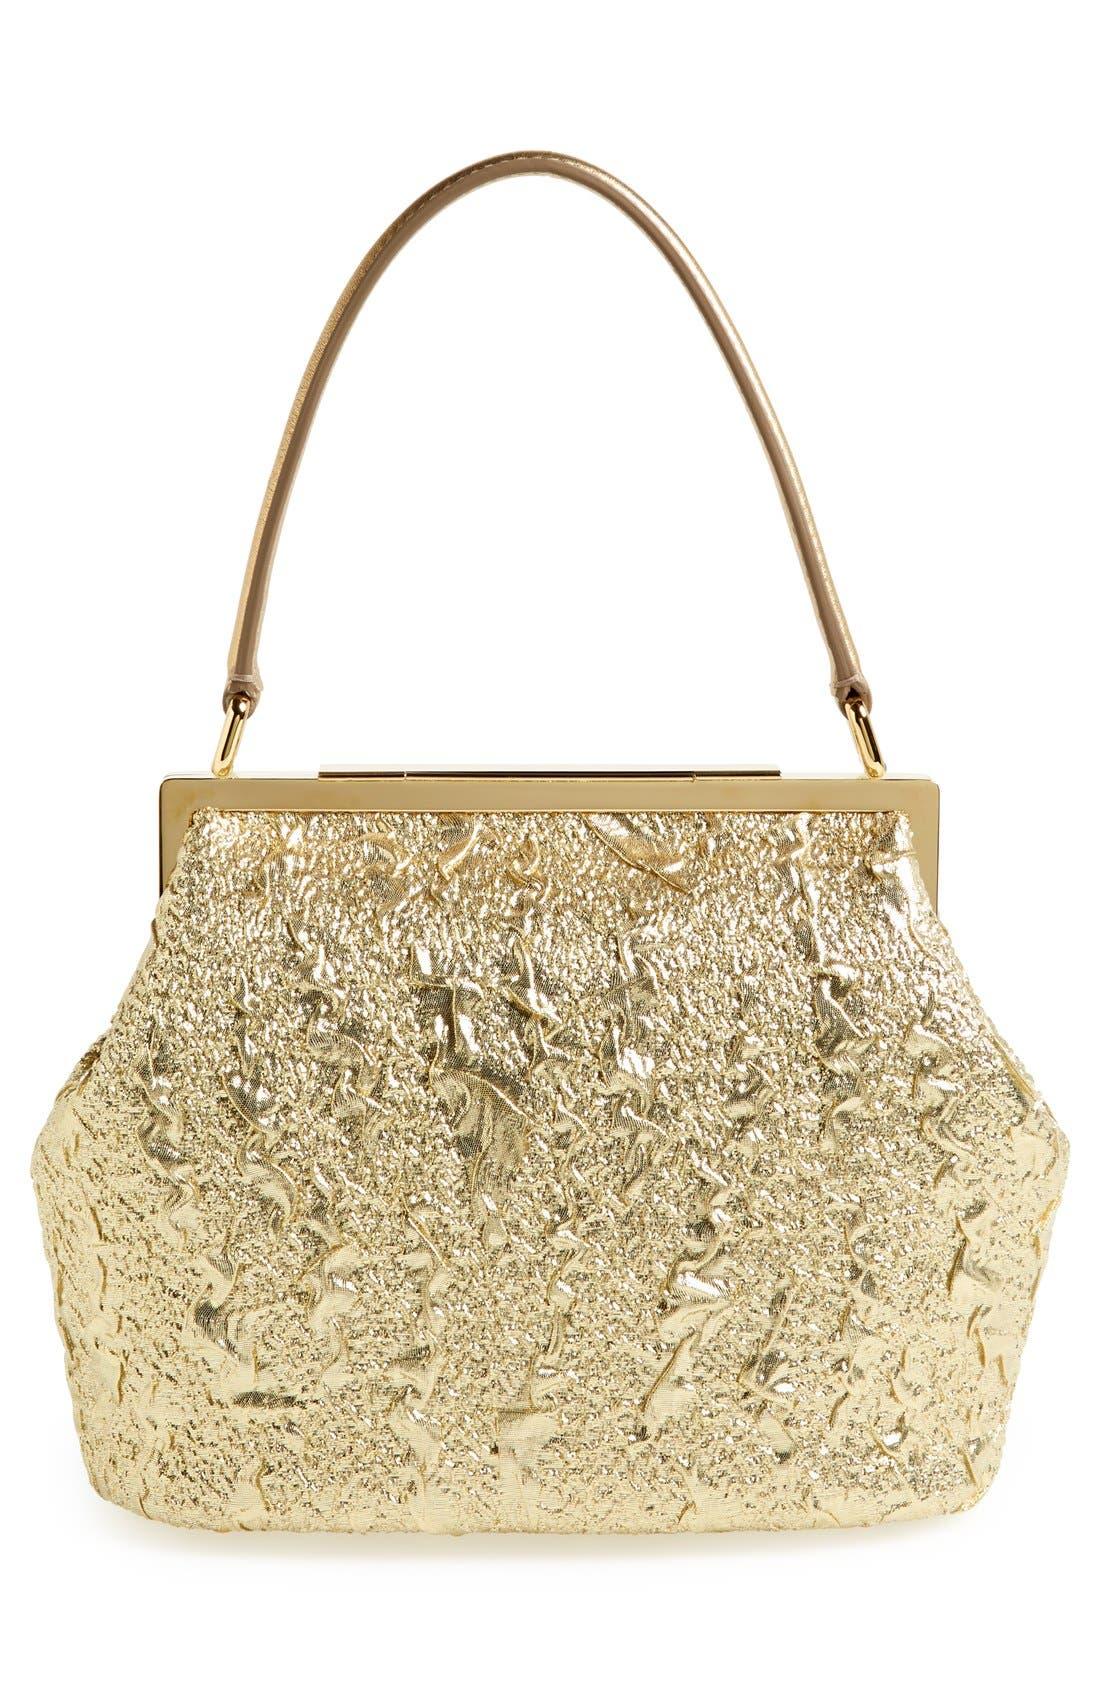 Brocade Handbag,                             Alternate thumbnail 3, color,                             710